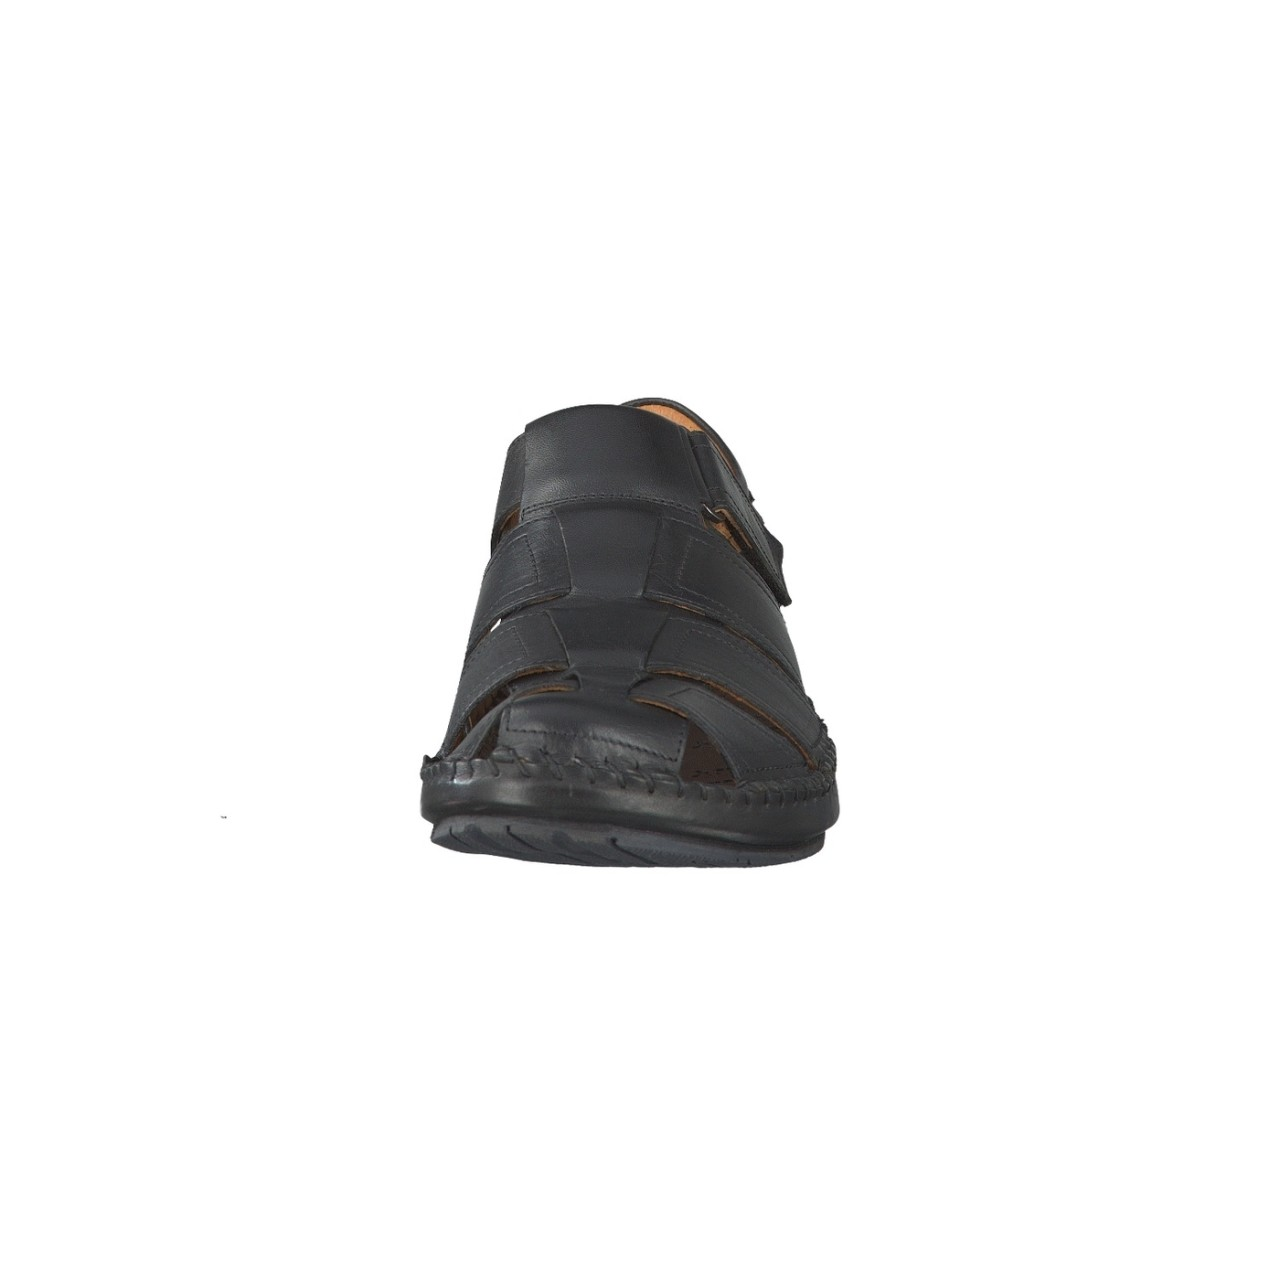 Pikolinos Pikolinos schwarz schwarz Komfort Sandalen Komfort Sandalen schwarz Pikolinos Komfort schwarz schwarz schwarz Sandalen rrwzOf